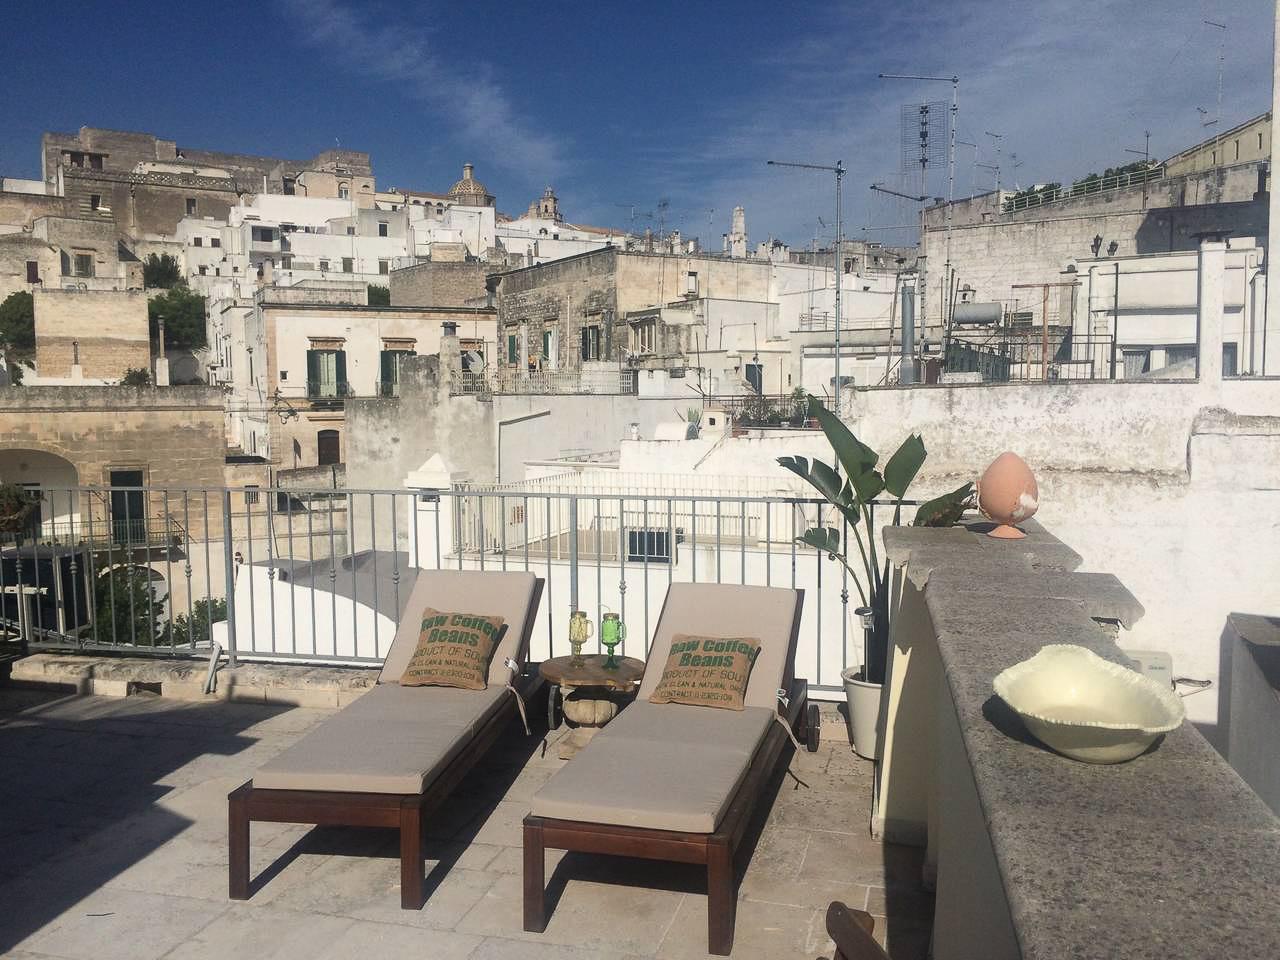 ckanani-wheretostayinpuglia-Airbnb2.jpg